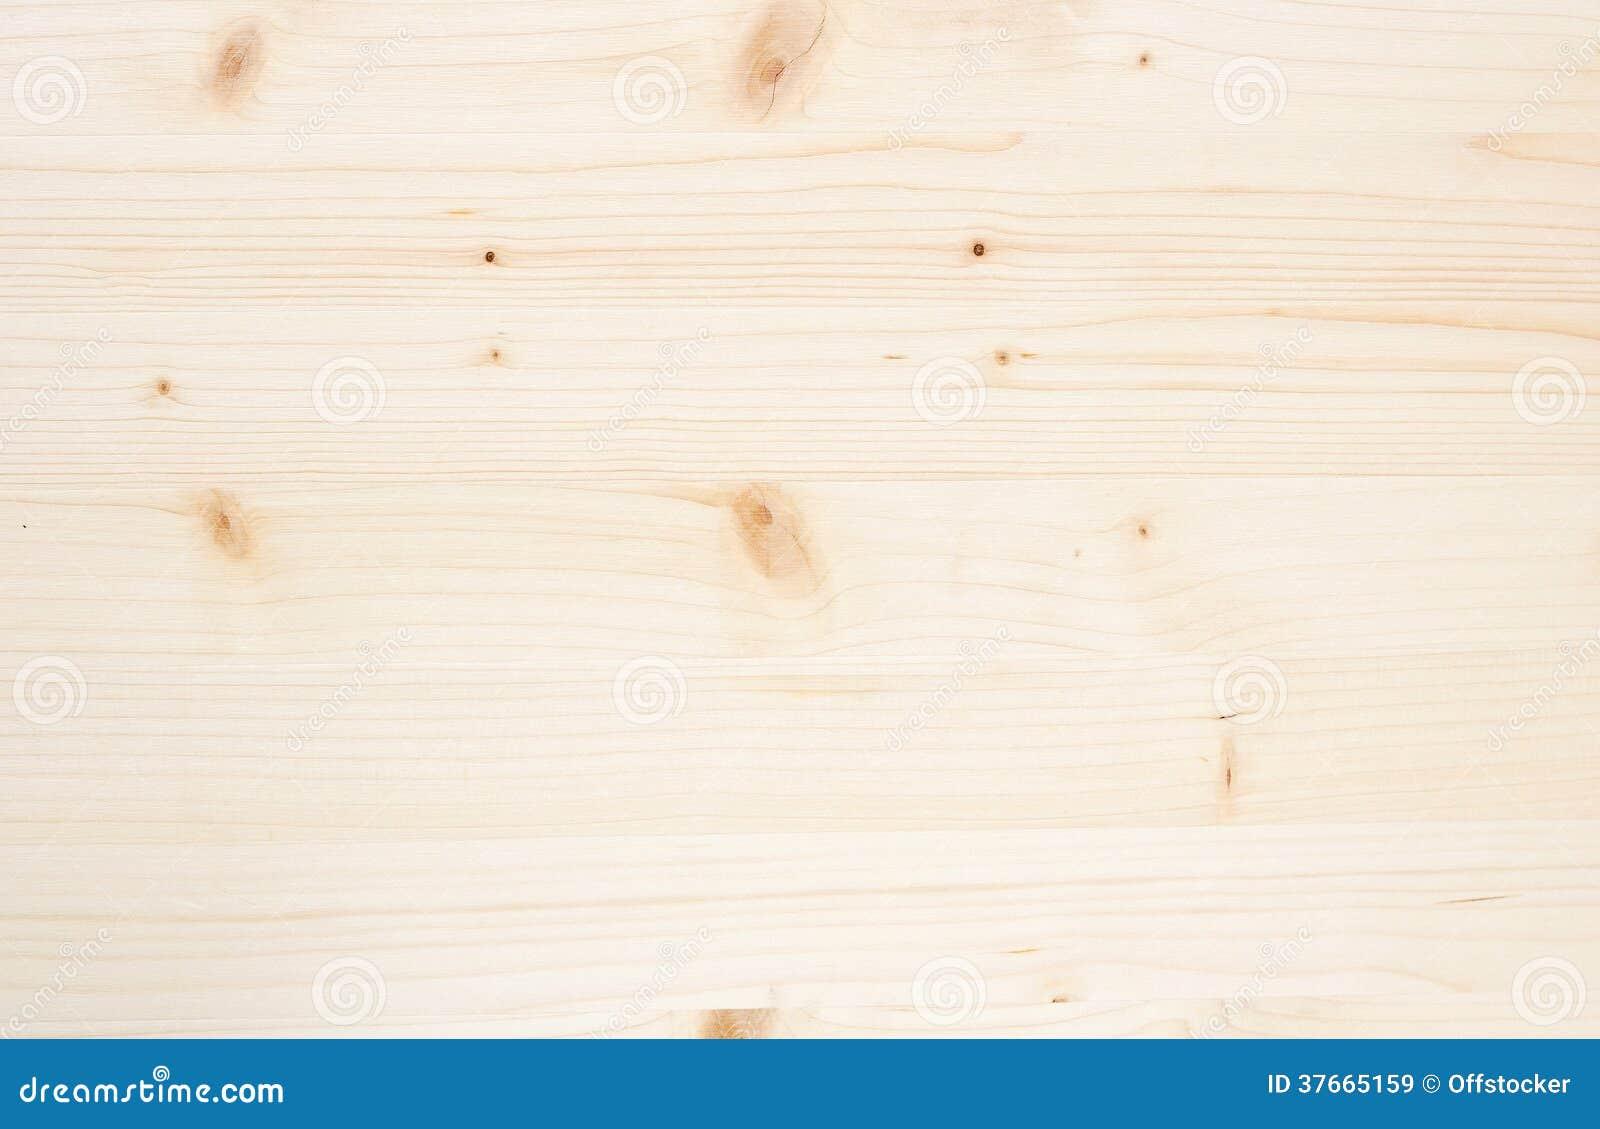 Light Wood Background Royalty Free Stock Images - Image: 37665159